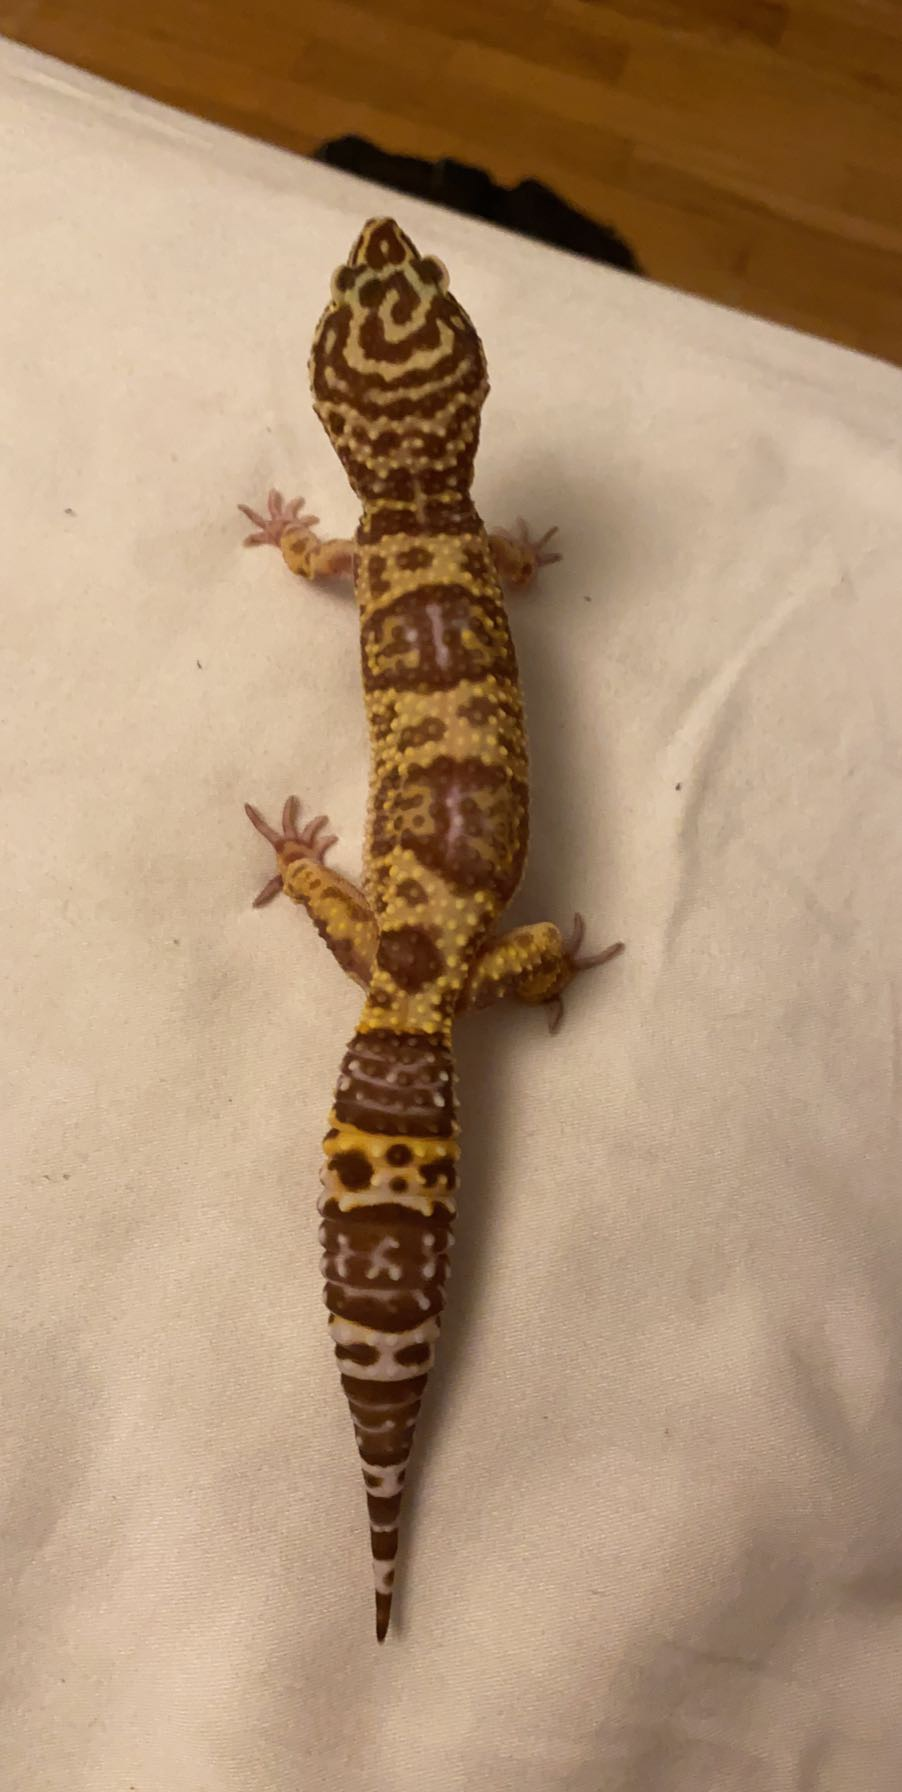 Leopard Gecko Morph-fd42ad66-0323-4f41-98cc-235f6a8bec97_1584667552065.jpeg